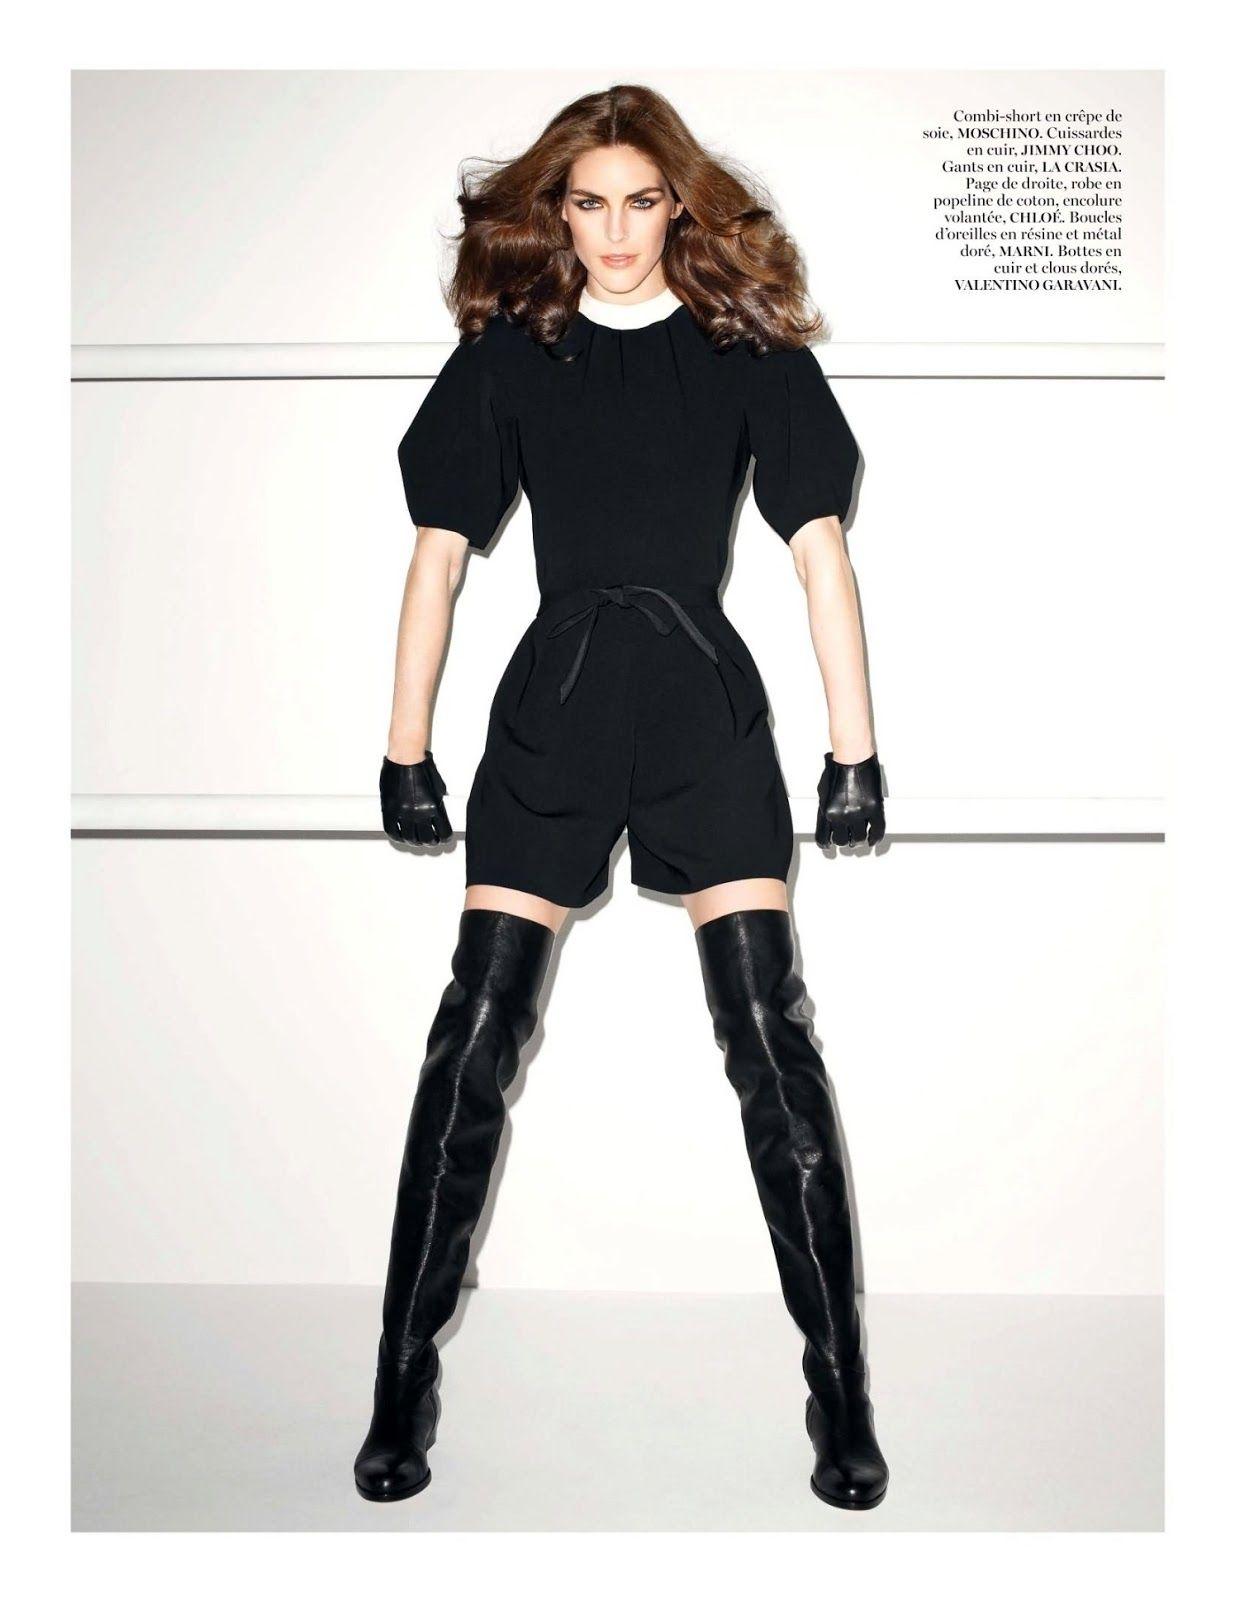 #HilaryRhoda by #TerryRichardson for #VogueParis June/July 2013